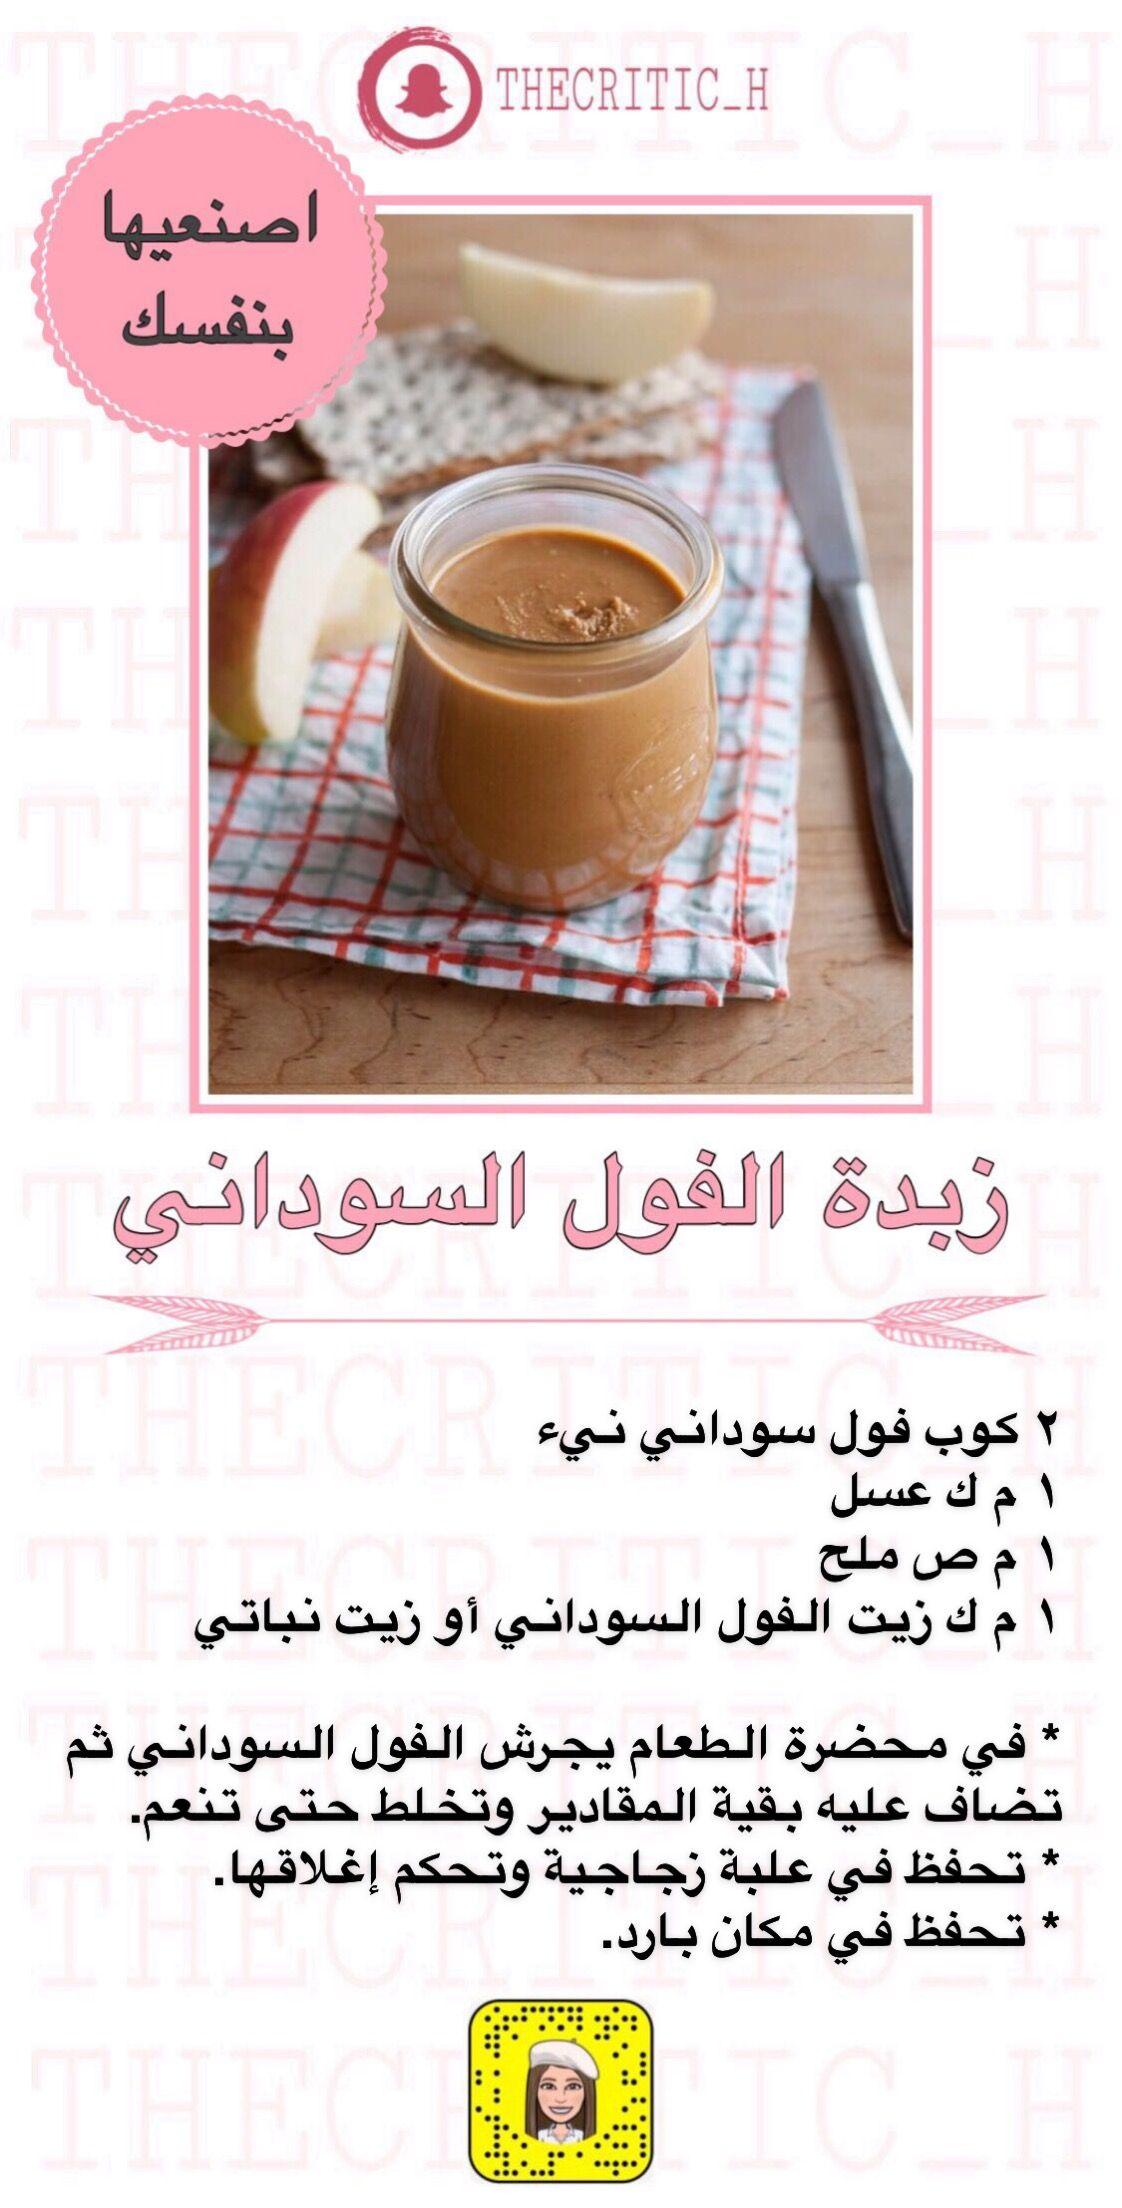 زبدة الفول السوداني In 2021 Yummy Food Food Receipes Food